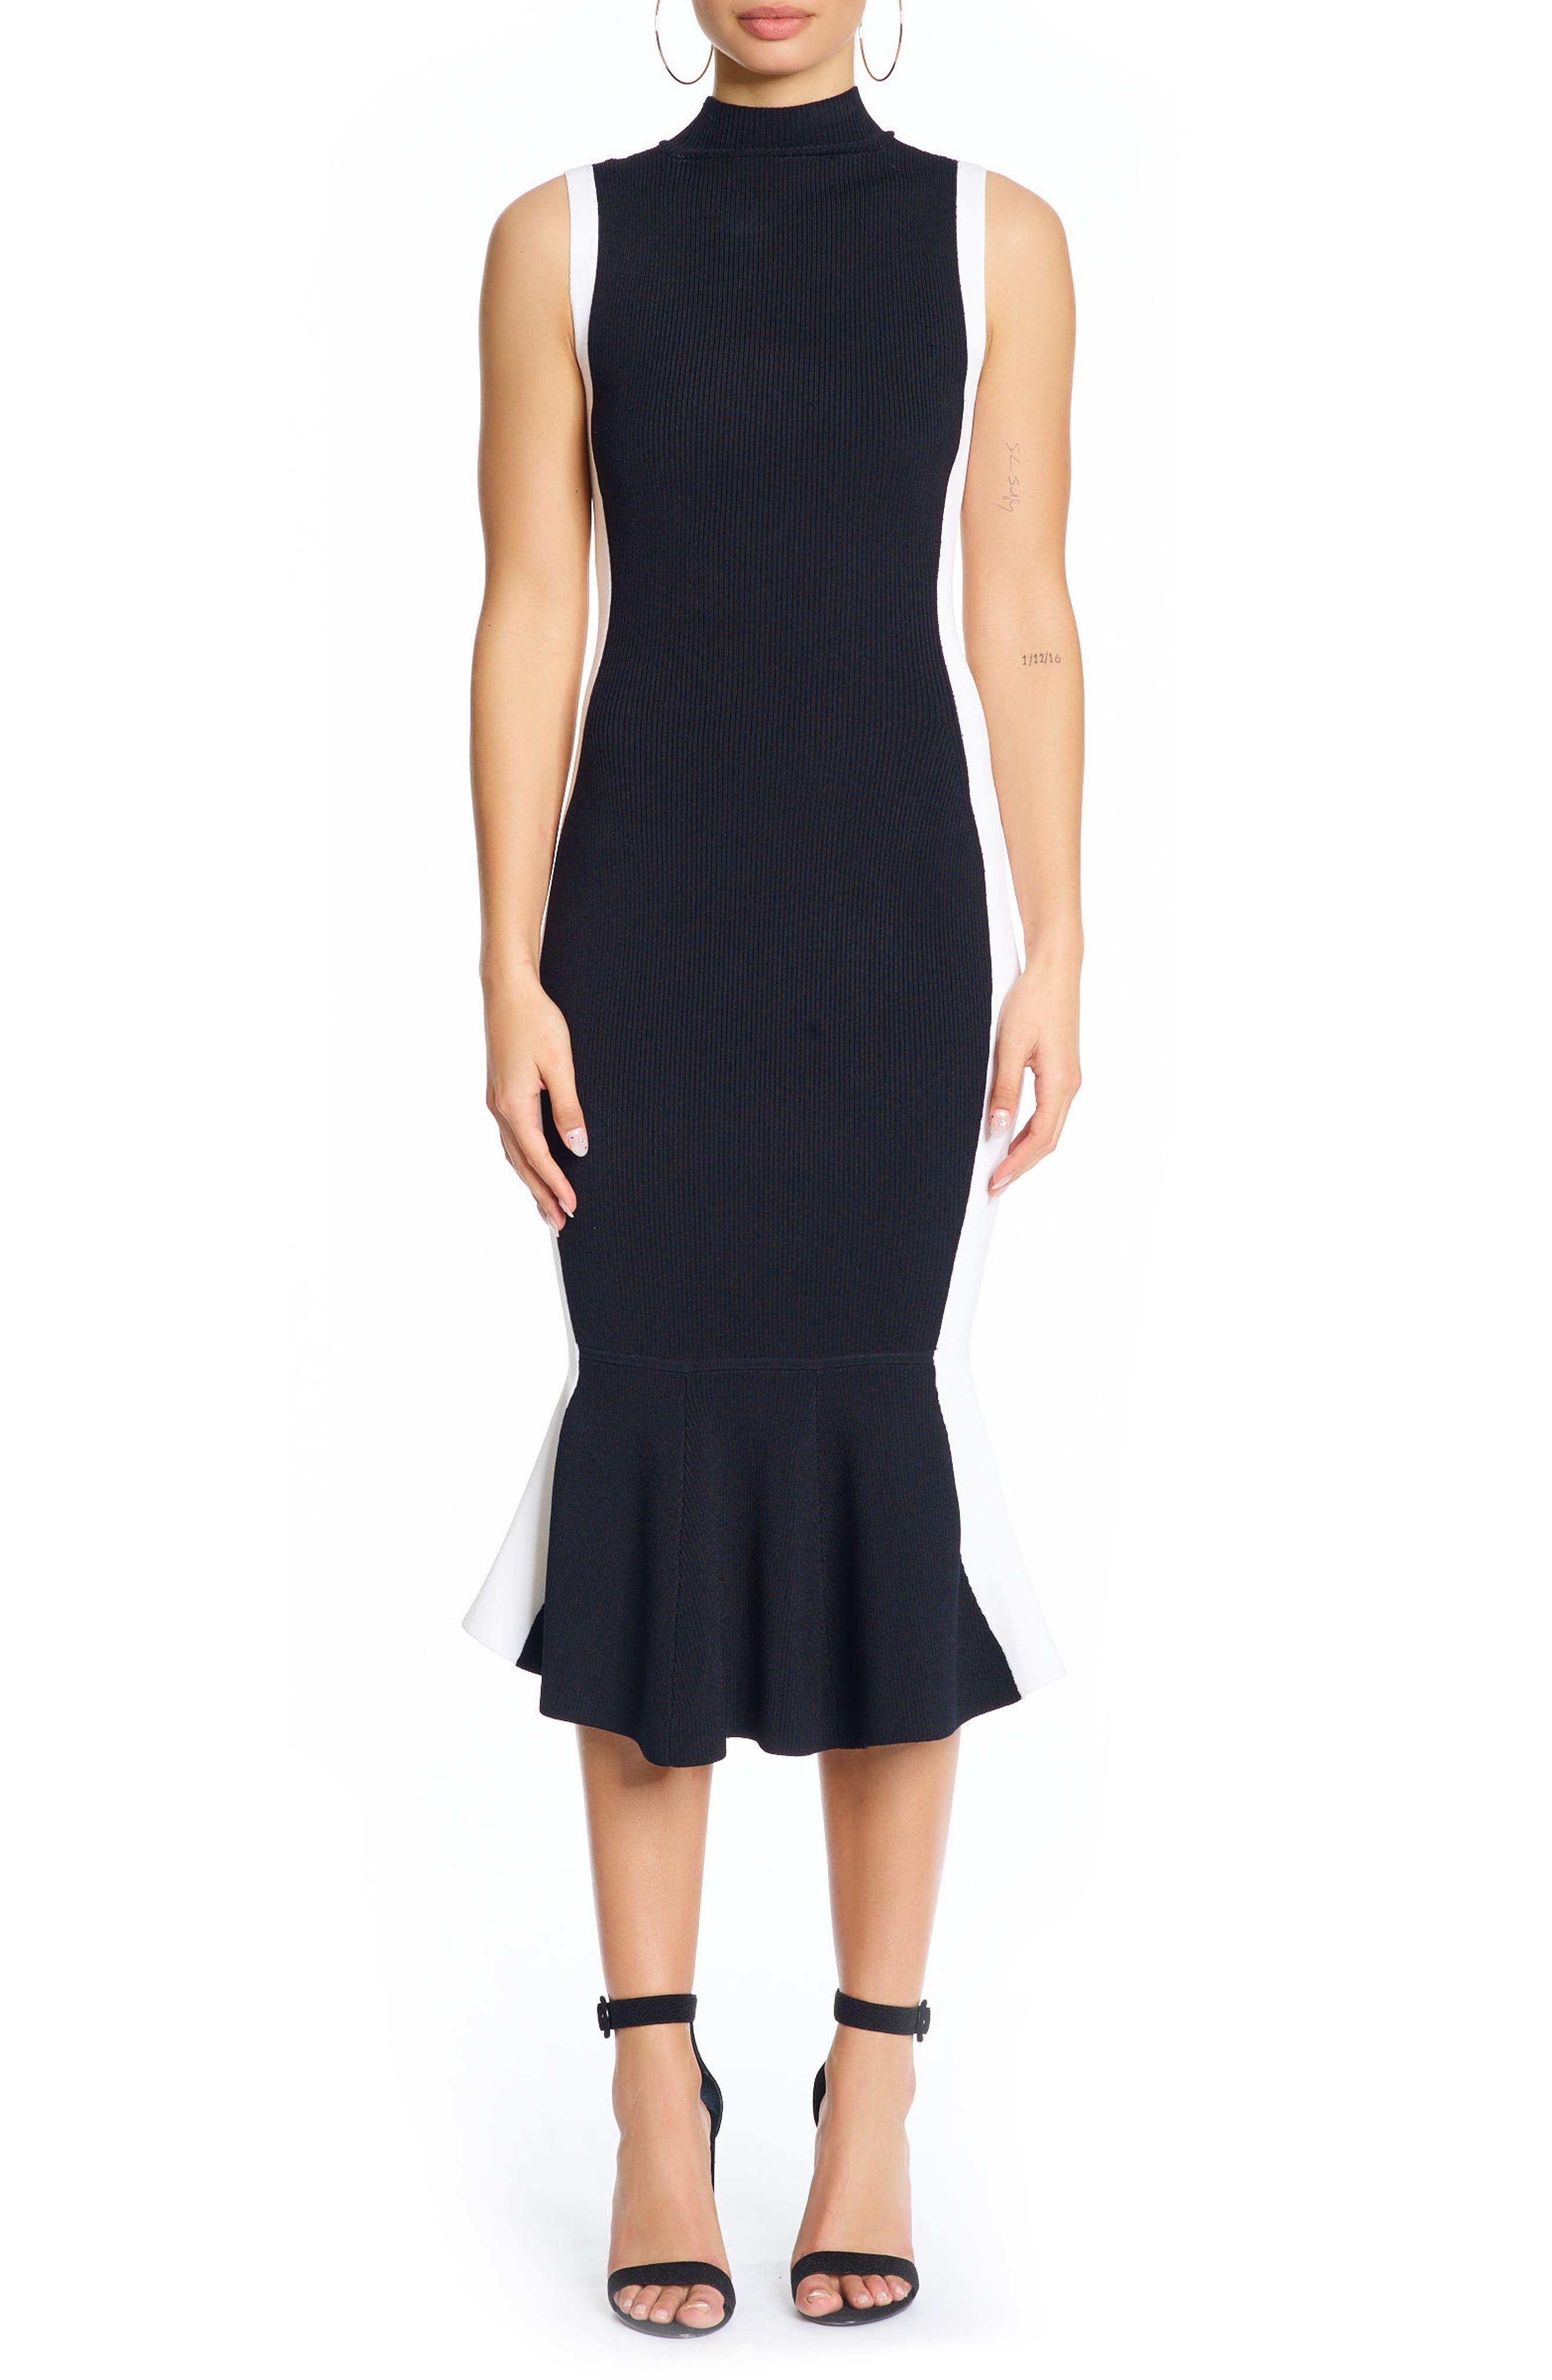 Alternate Image 1 Selected - KENDALL + KYLIE Illusion Peplum Dress